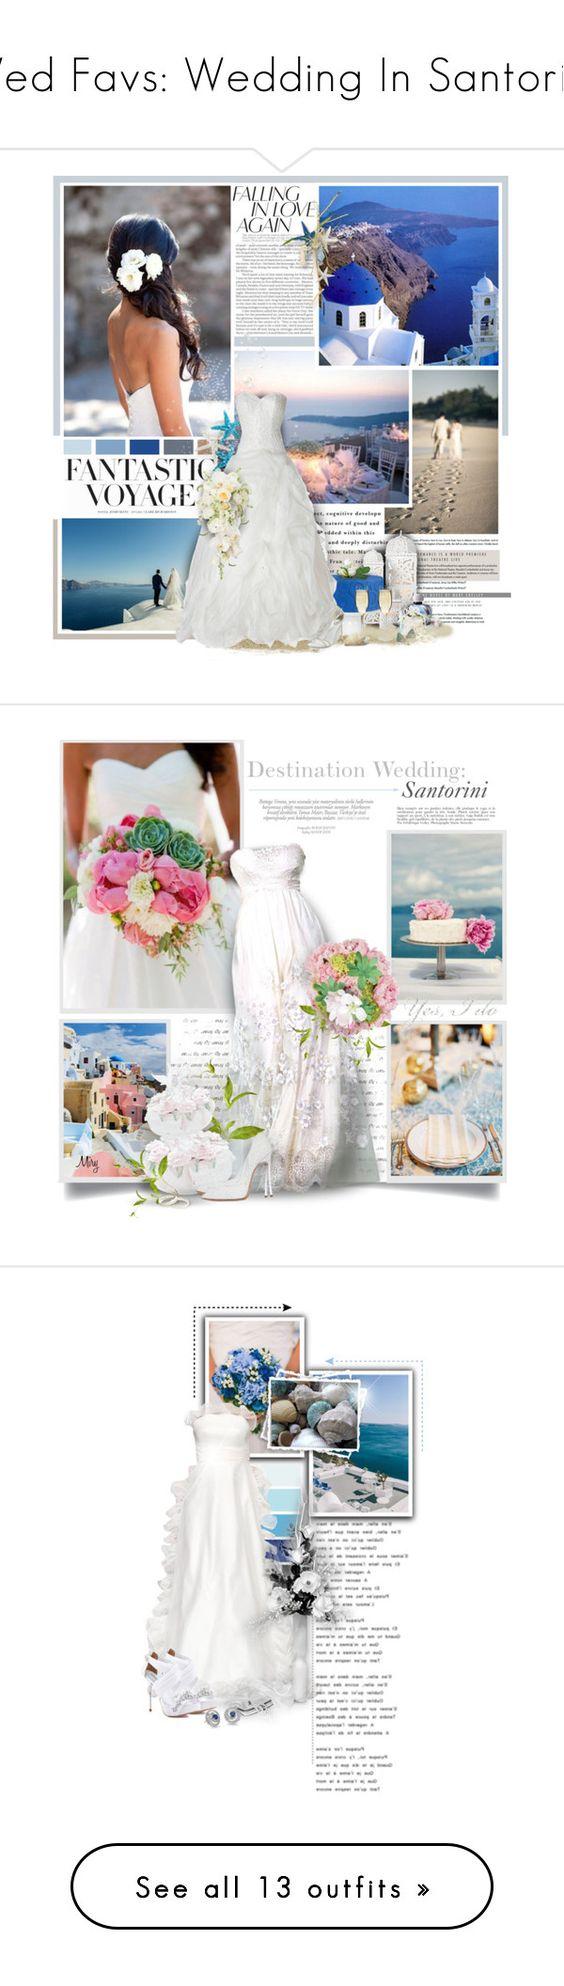 """Wed Favs: Wedding In Santorini"" by anna-nemesis ❤ liked on Polyvore featuring wedding, Greece, H&M, Casablanca, Christian Dior, Avance, René Caovilla, Calla, Bottega Veneta and Anja"